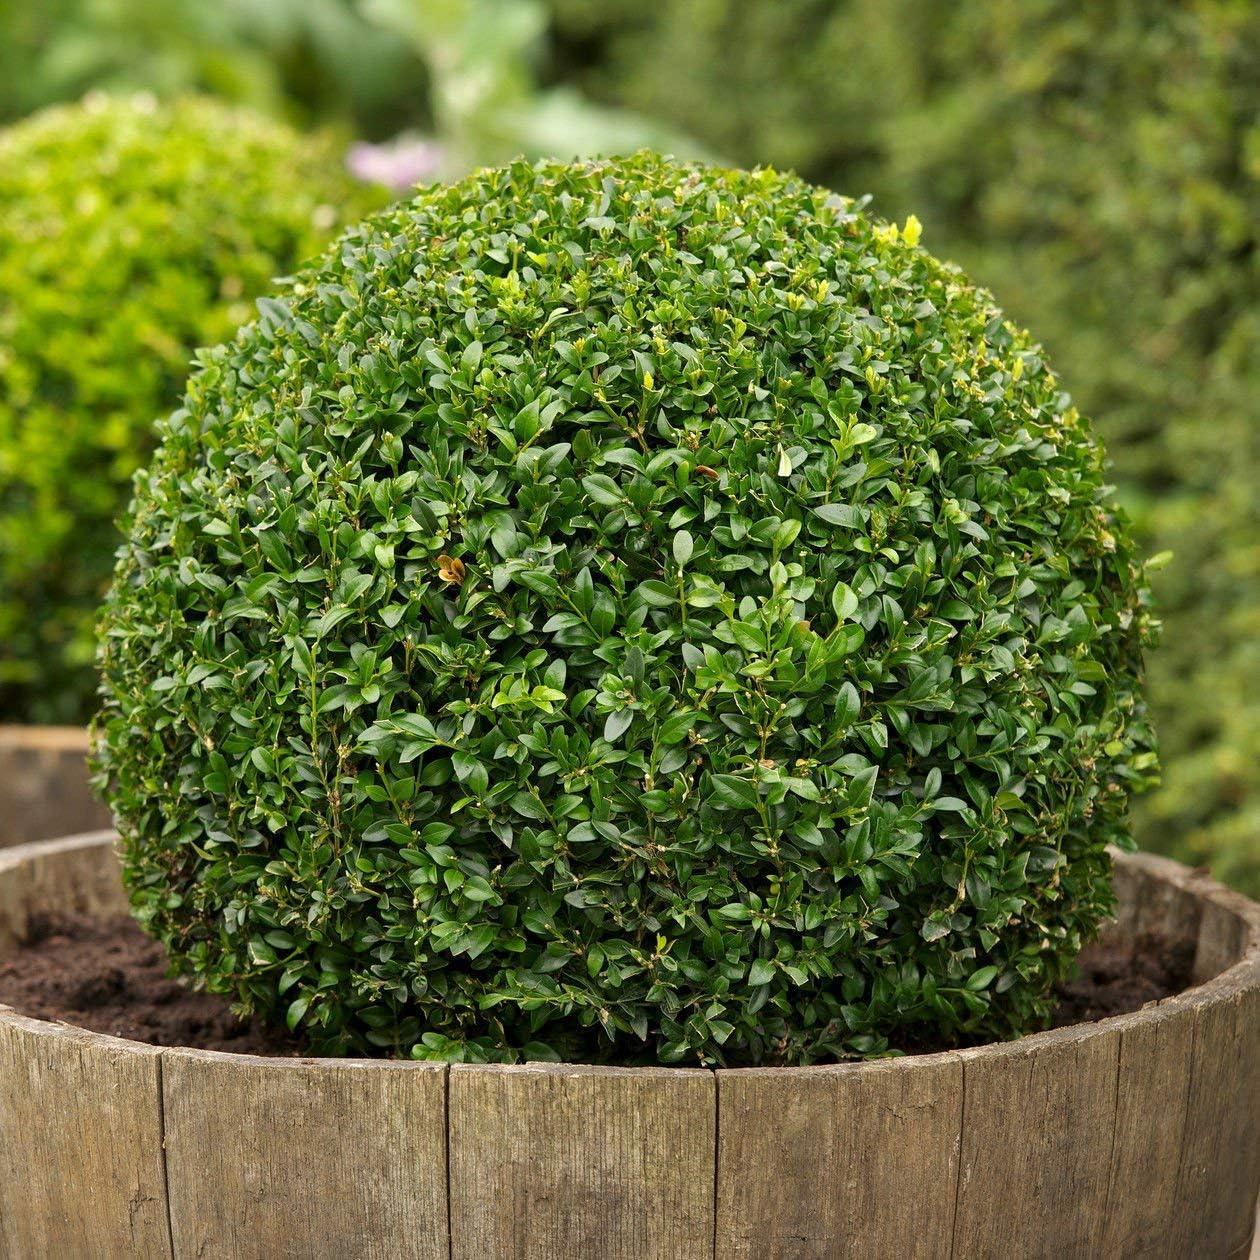 Boxwood Natural Evergreen Useful Beautiful Bonsai Seed Decoration  100 PCS